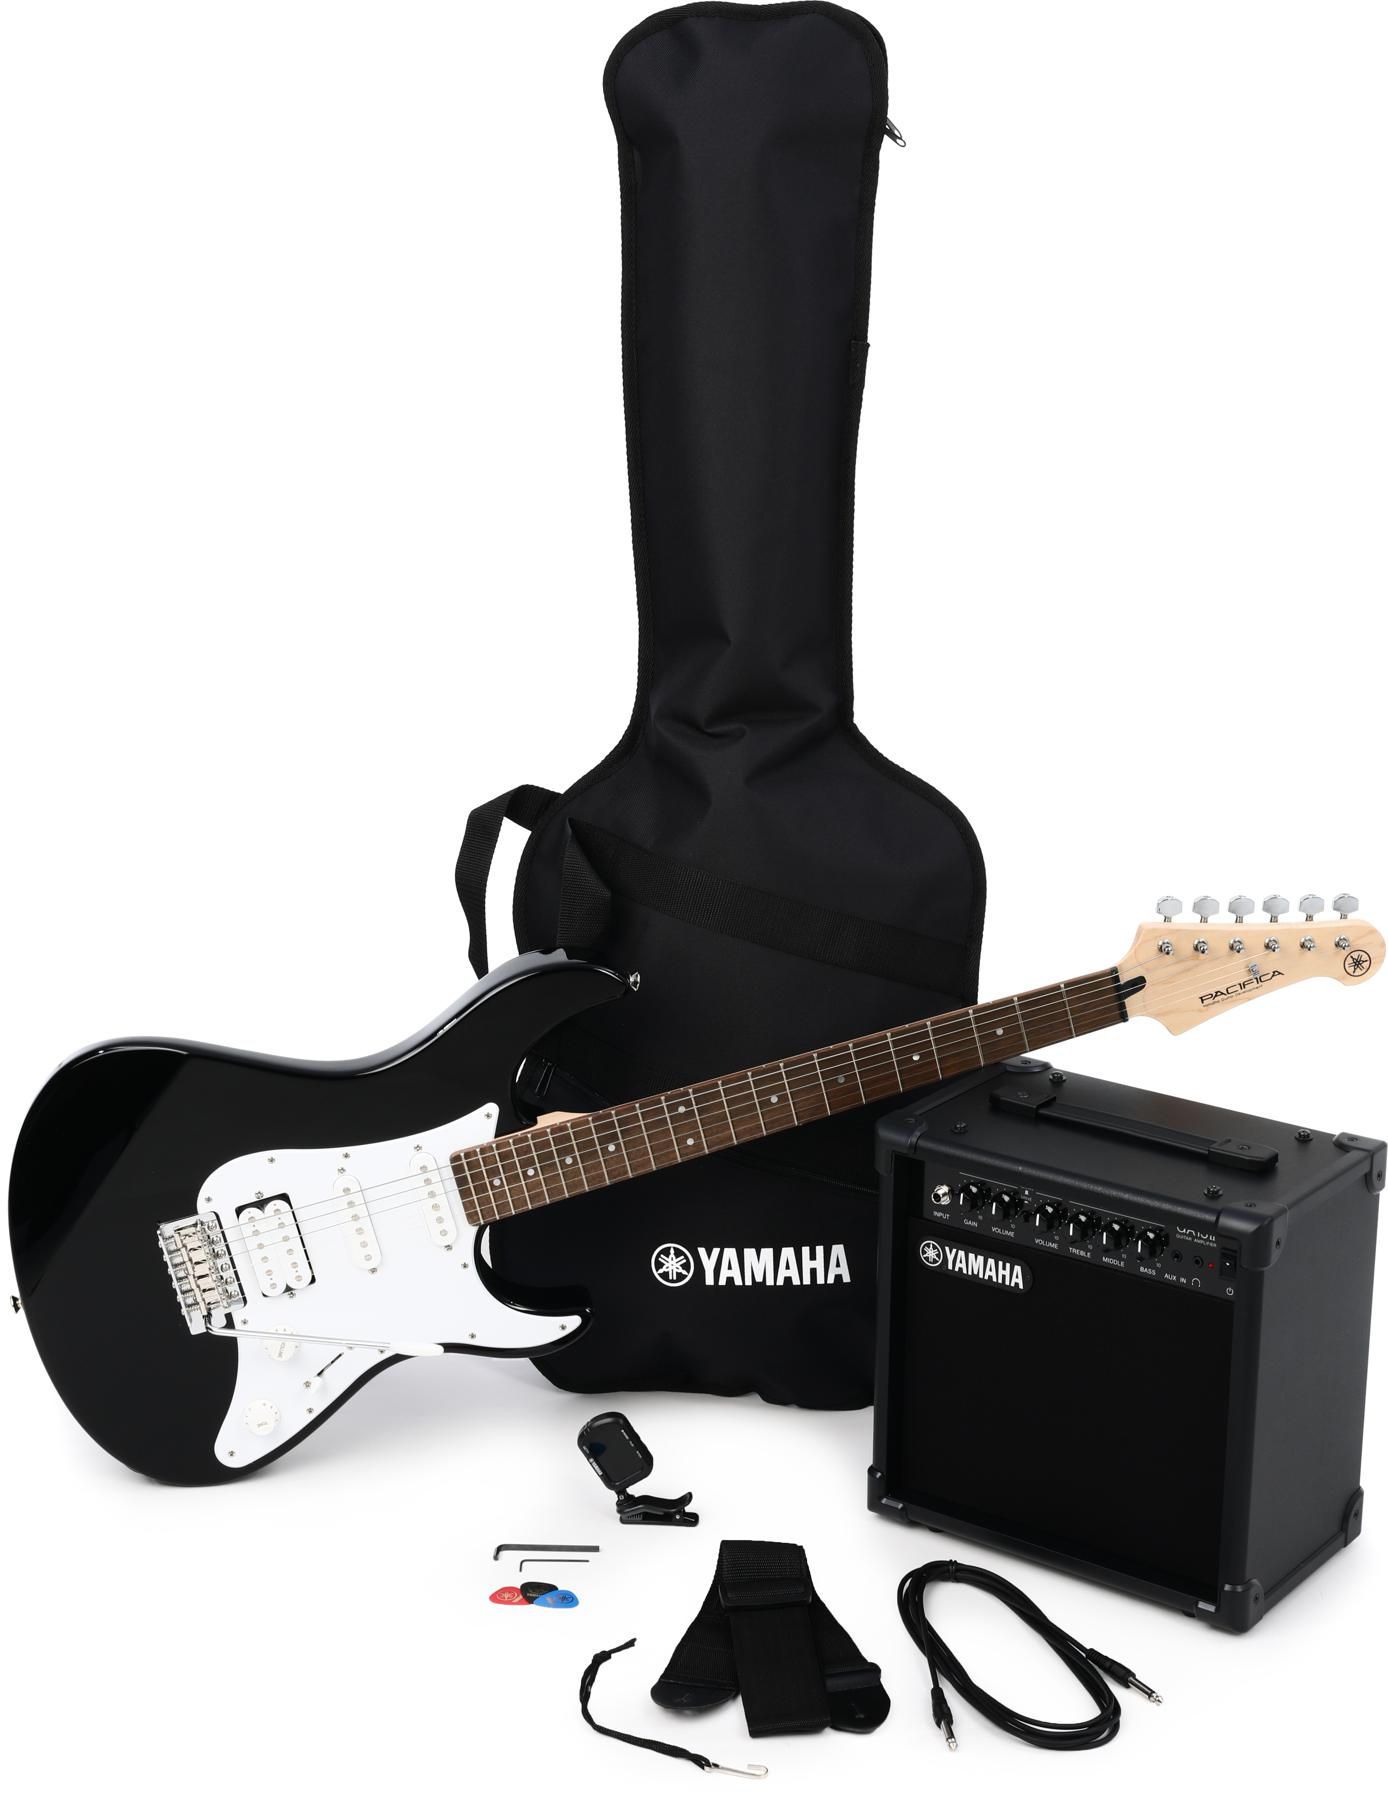 5. Yamaha GigMaker EG Electric Guitar Pack